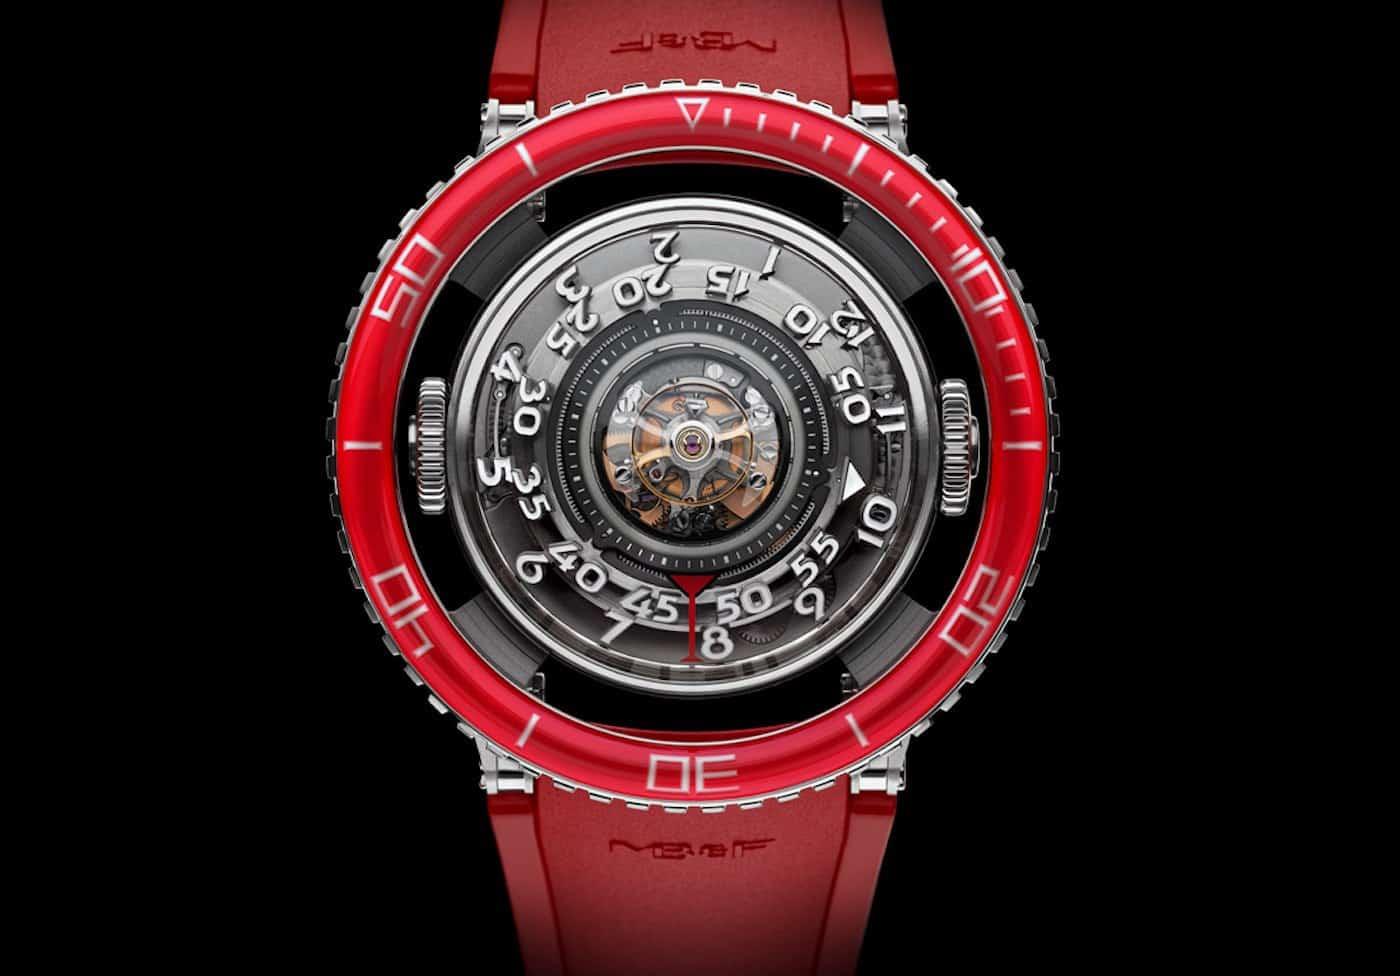 MBF HM7 Aquapod Platinum Red Watch 9